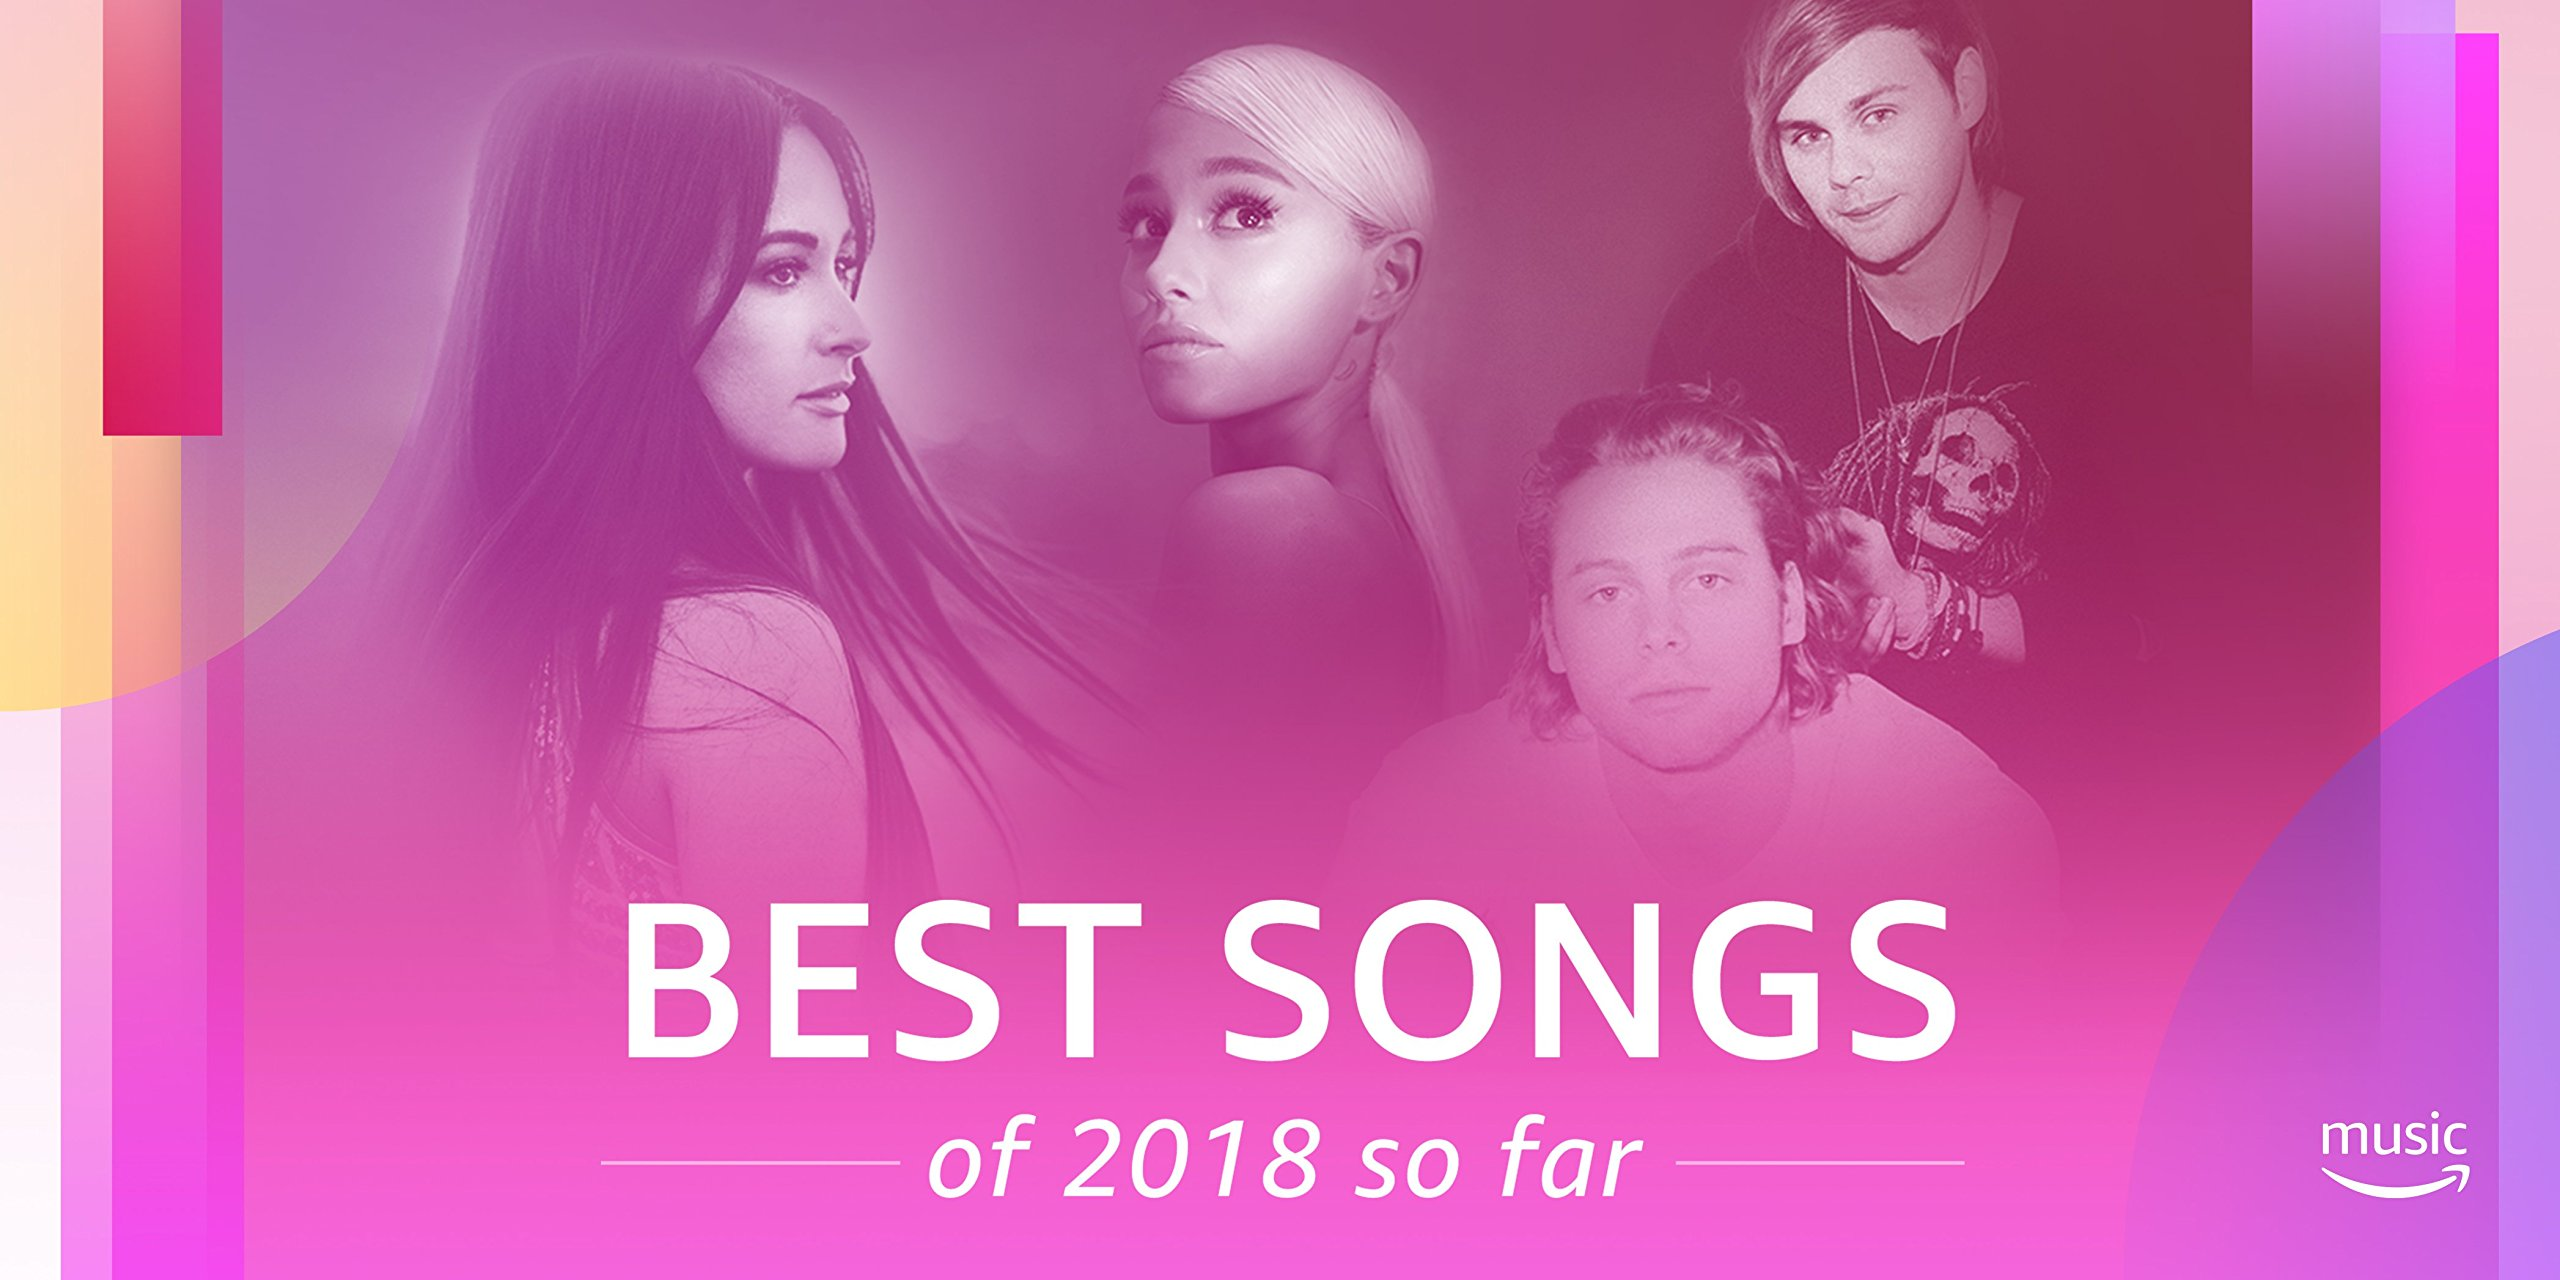 Best Songs of 2018 So Far